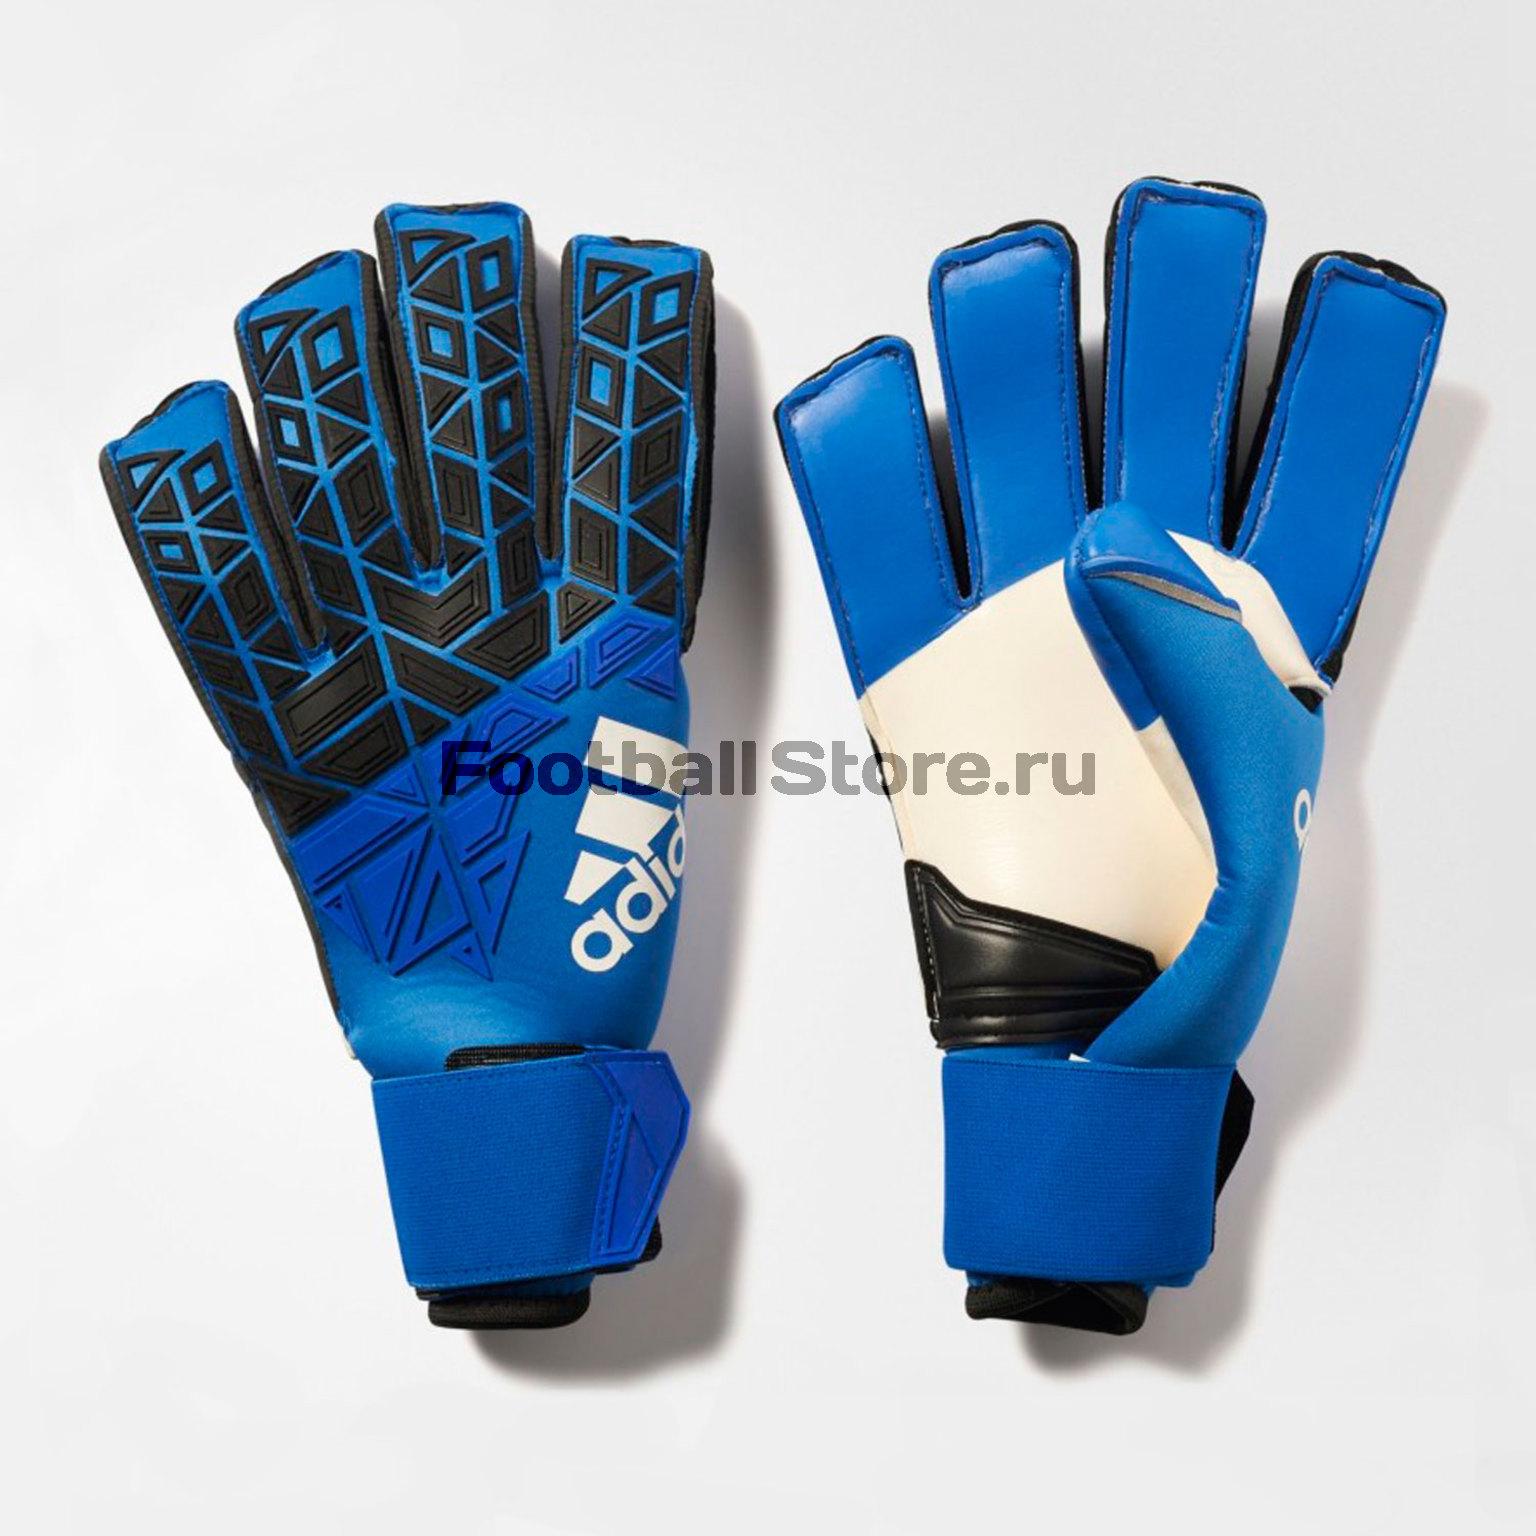 Перчатки вратарские Adidas Ace FS Promo AZ3707 перчатки вратарские adidas ace half neg az3688